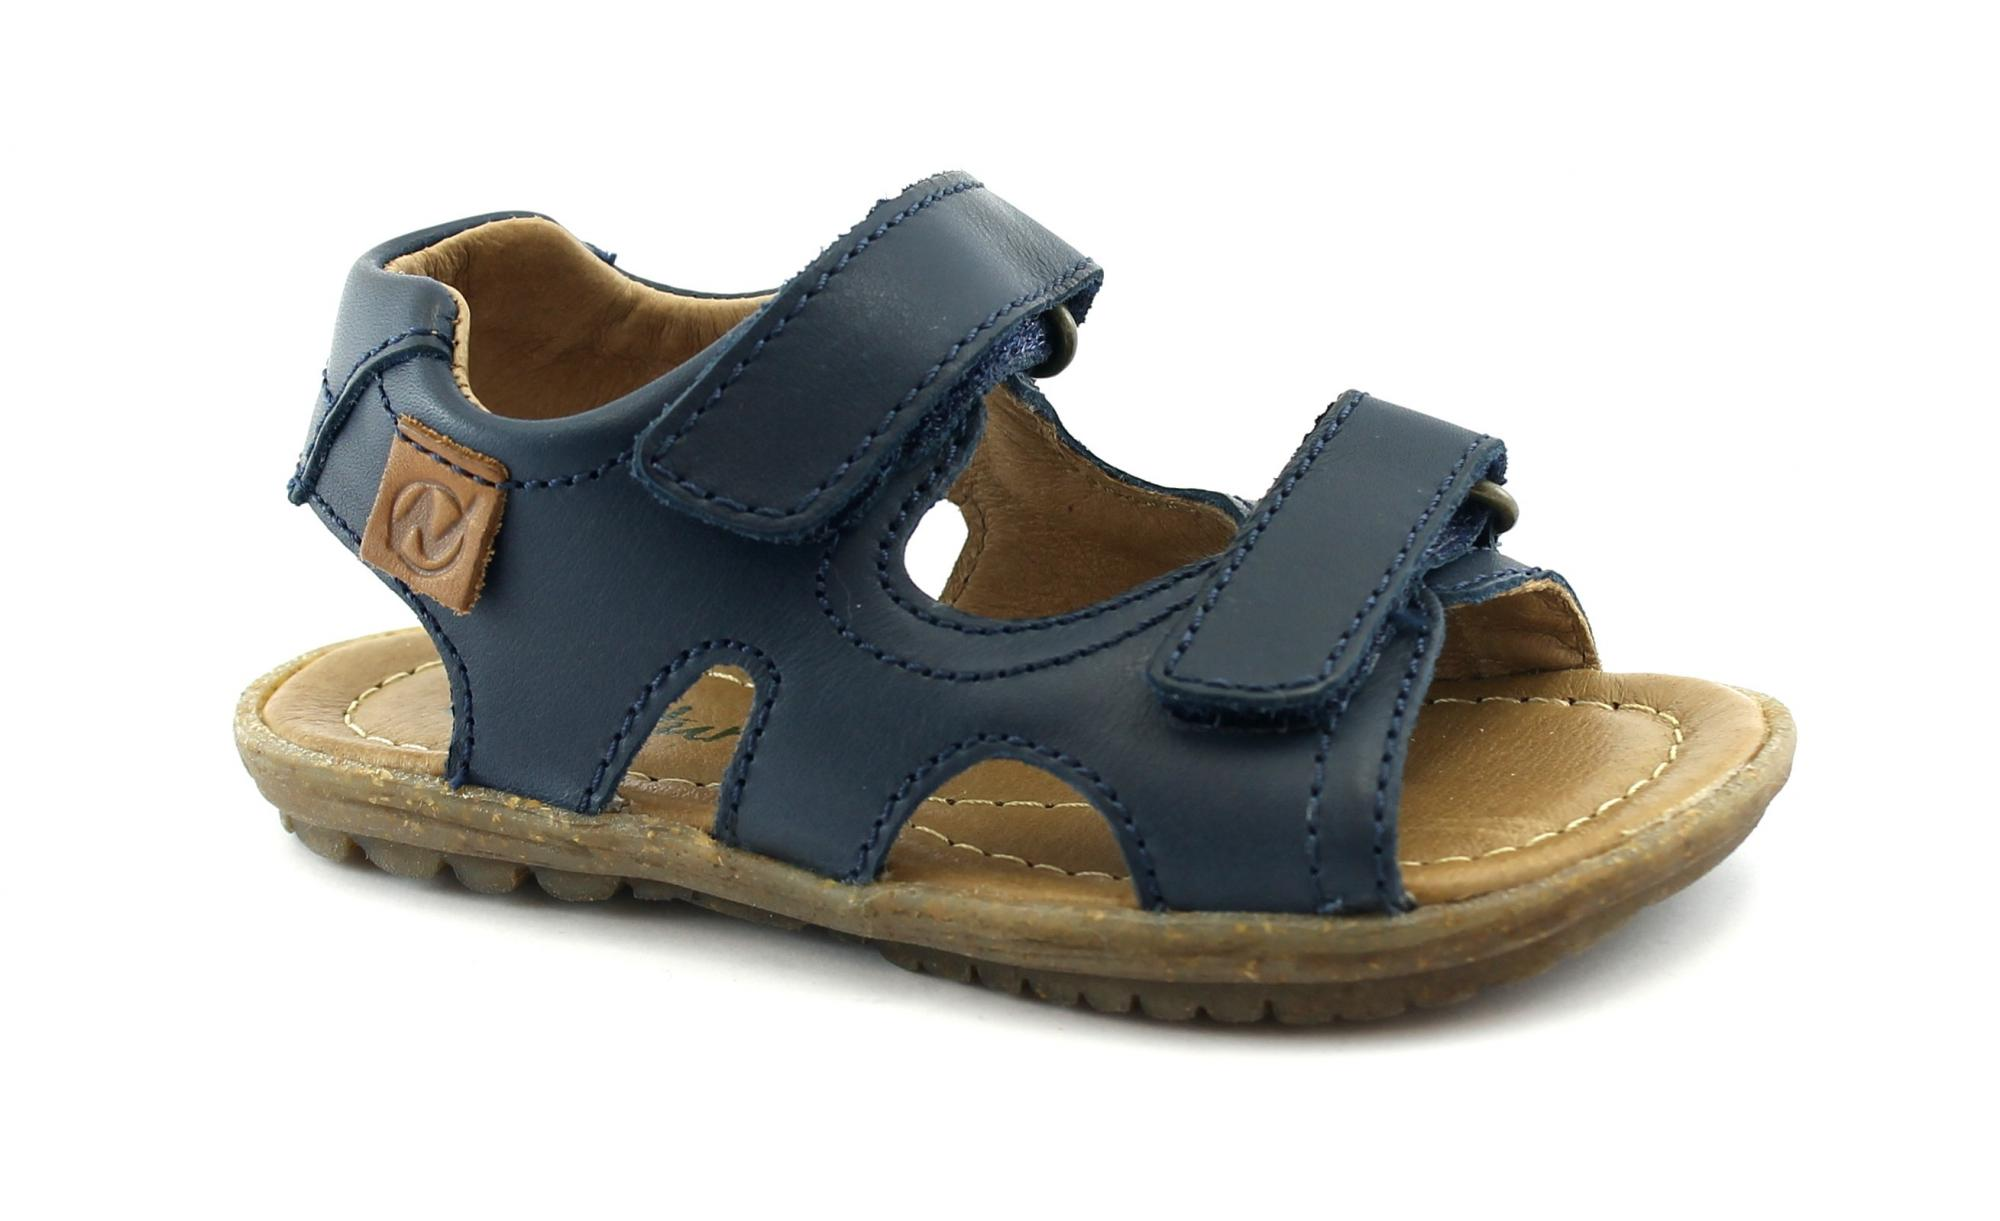 NATURINO SKY 502430 navy blu scarpe sandalo bambino pelle strappi